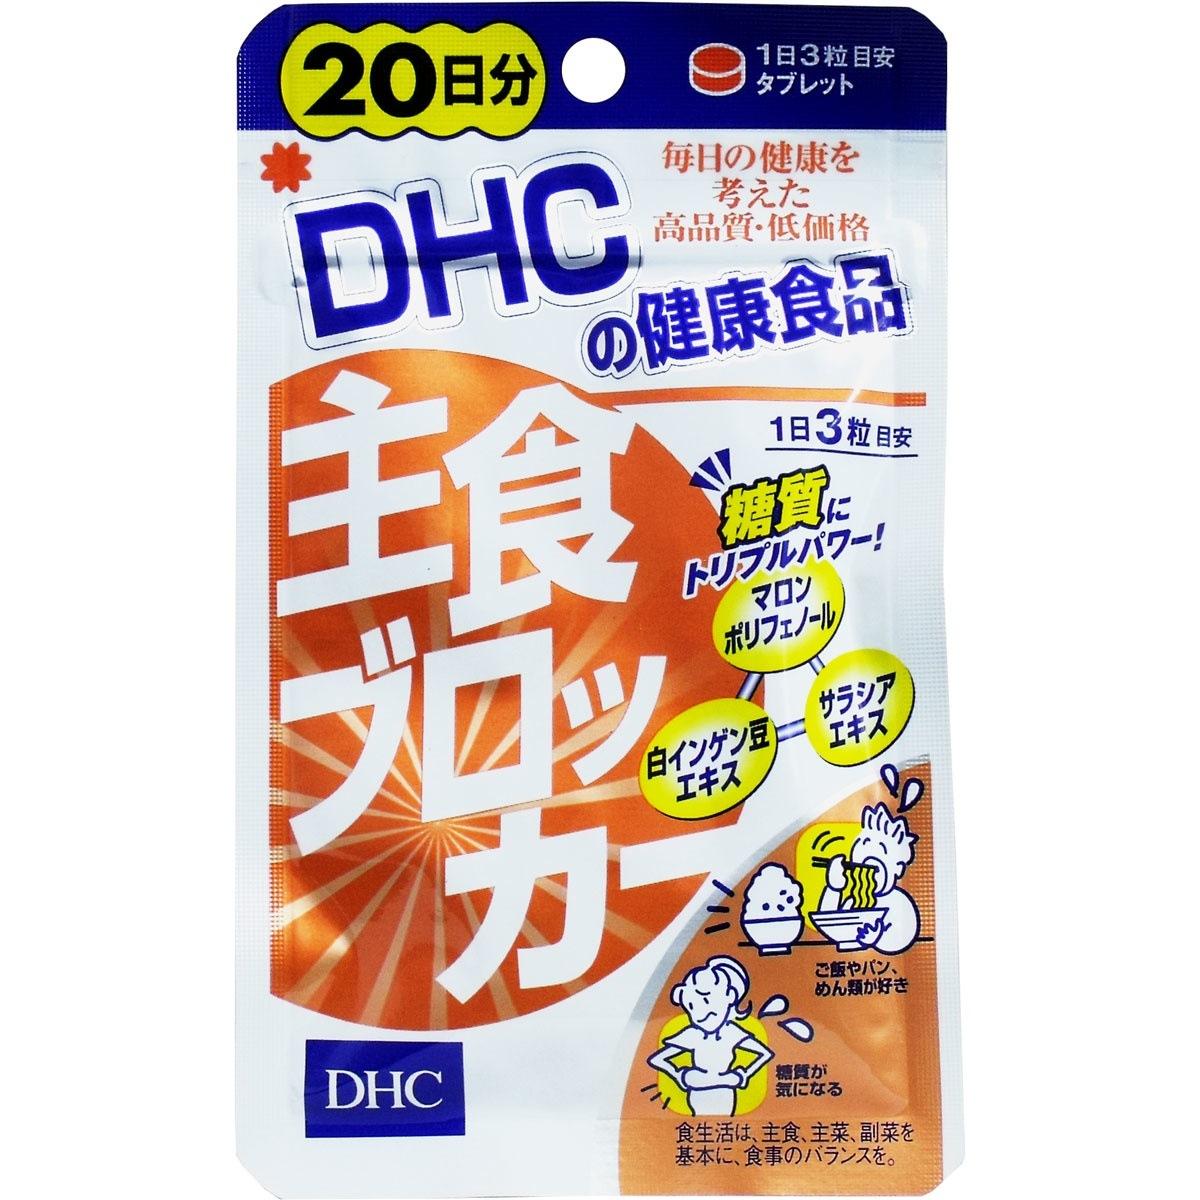 DHC 主食ブロッカー 20日分 60粒(12g)